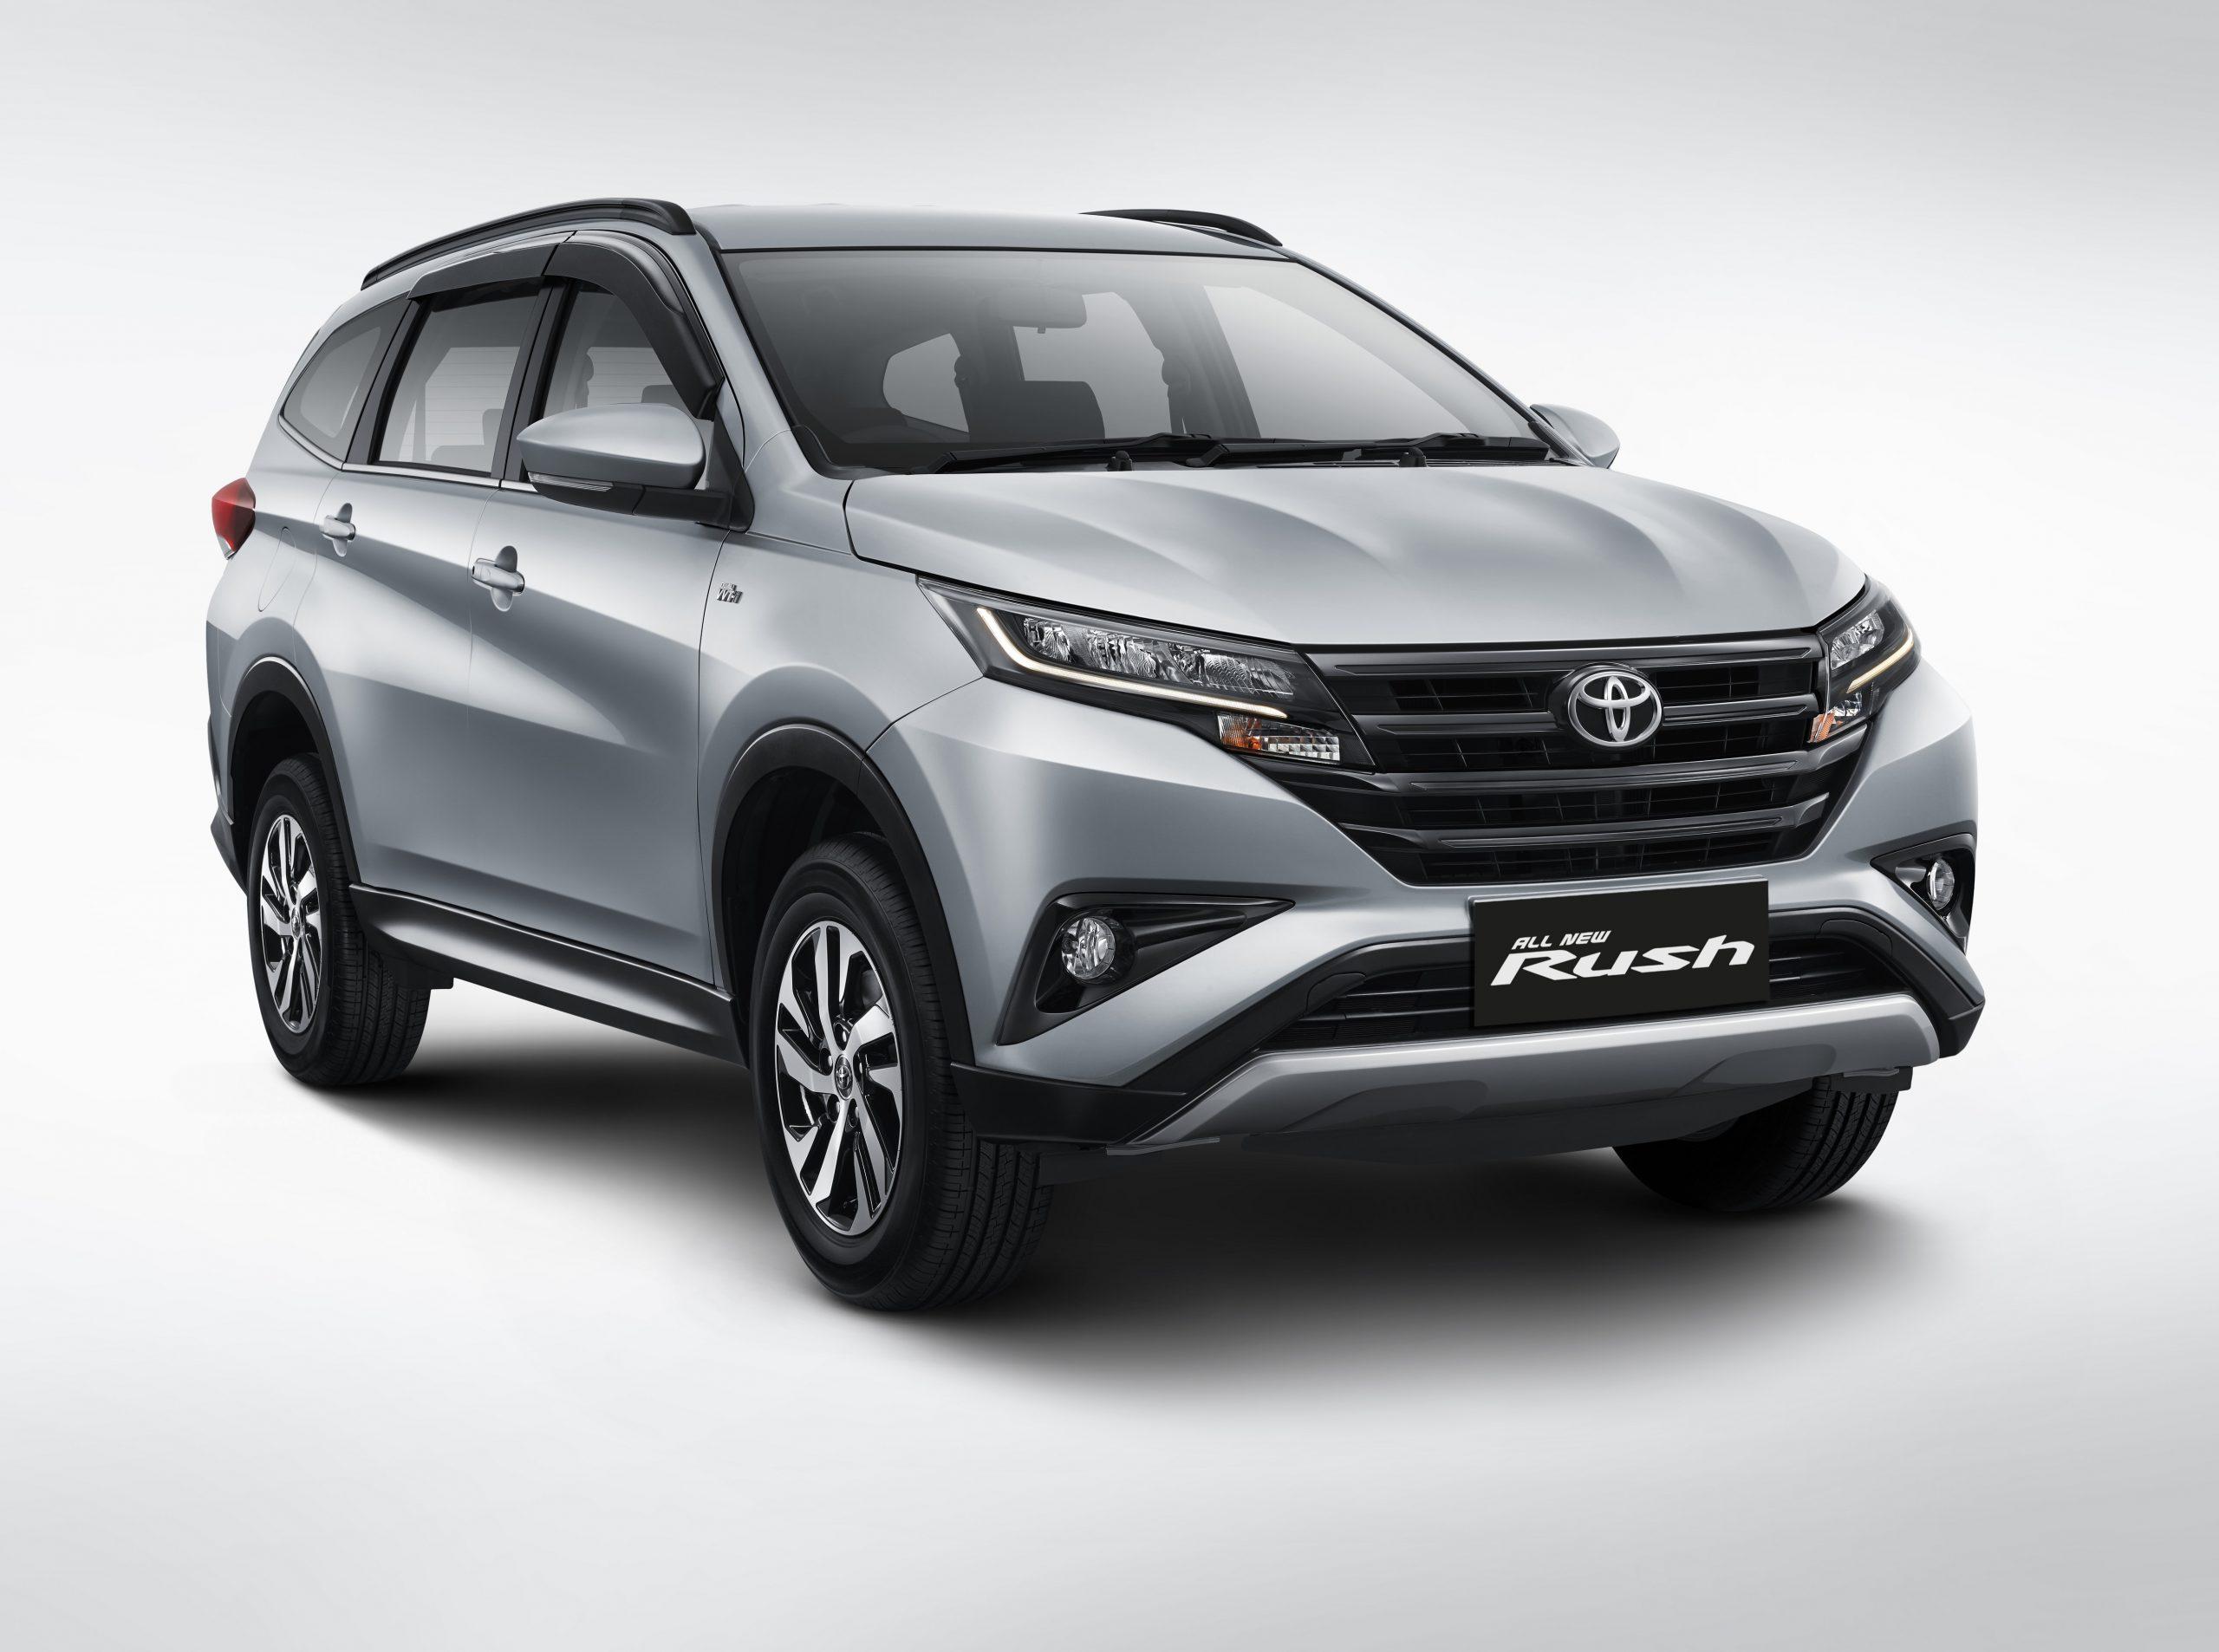 Menimbang Toyota Rush TRD Vs Xpander Cross Vs Suzuki XL7, Pilih Mana?